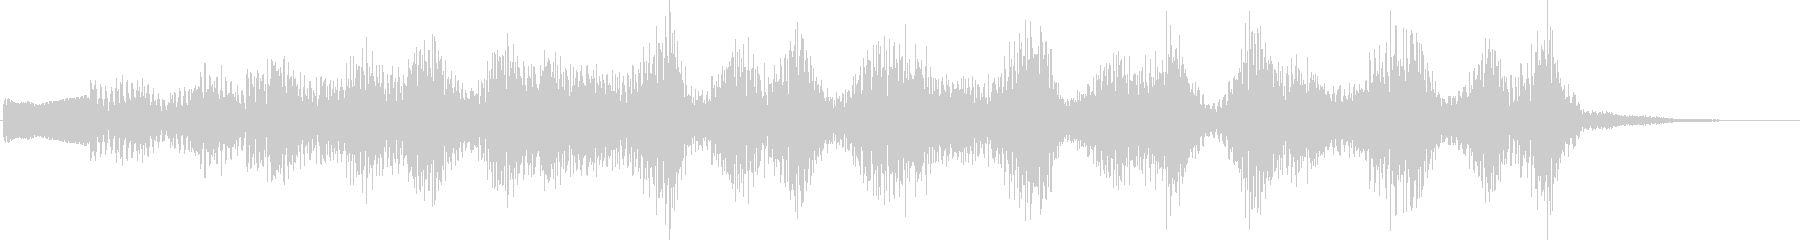 KANT考えてる時の音効果音08311の未再生の波形